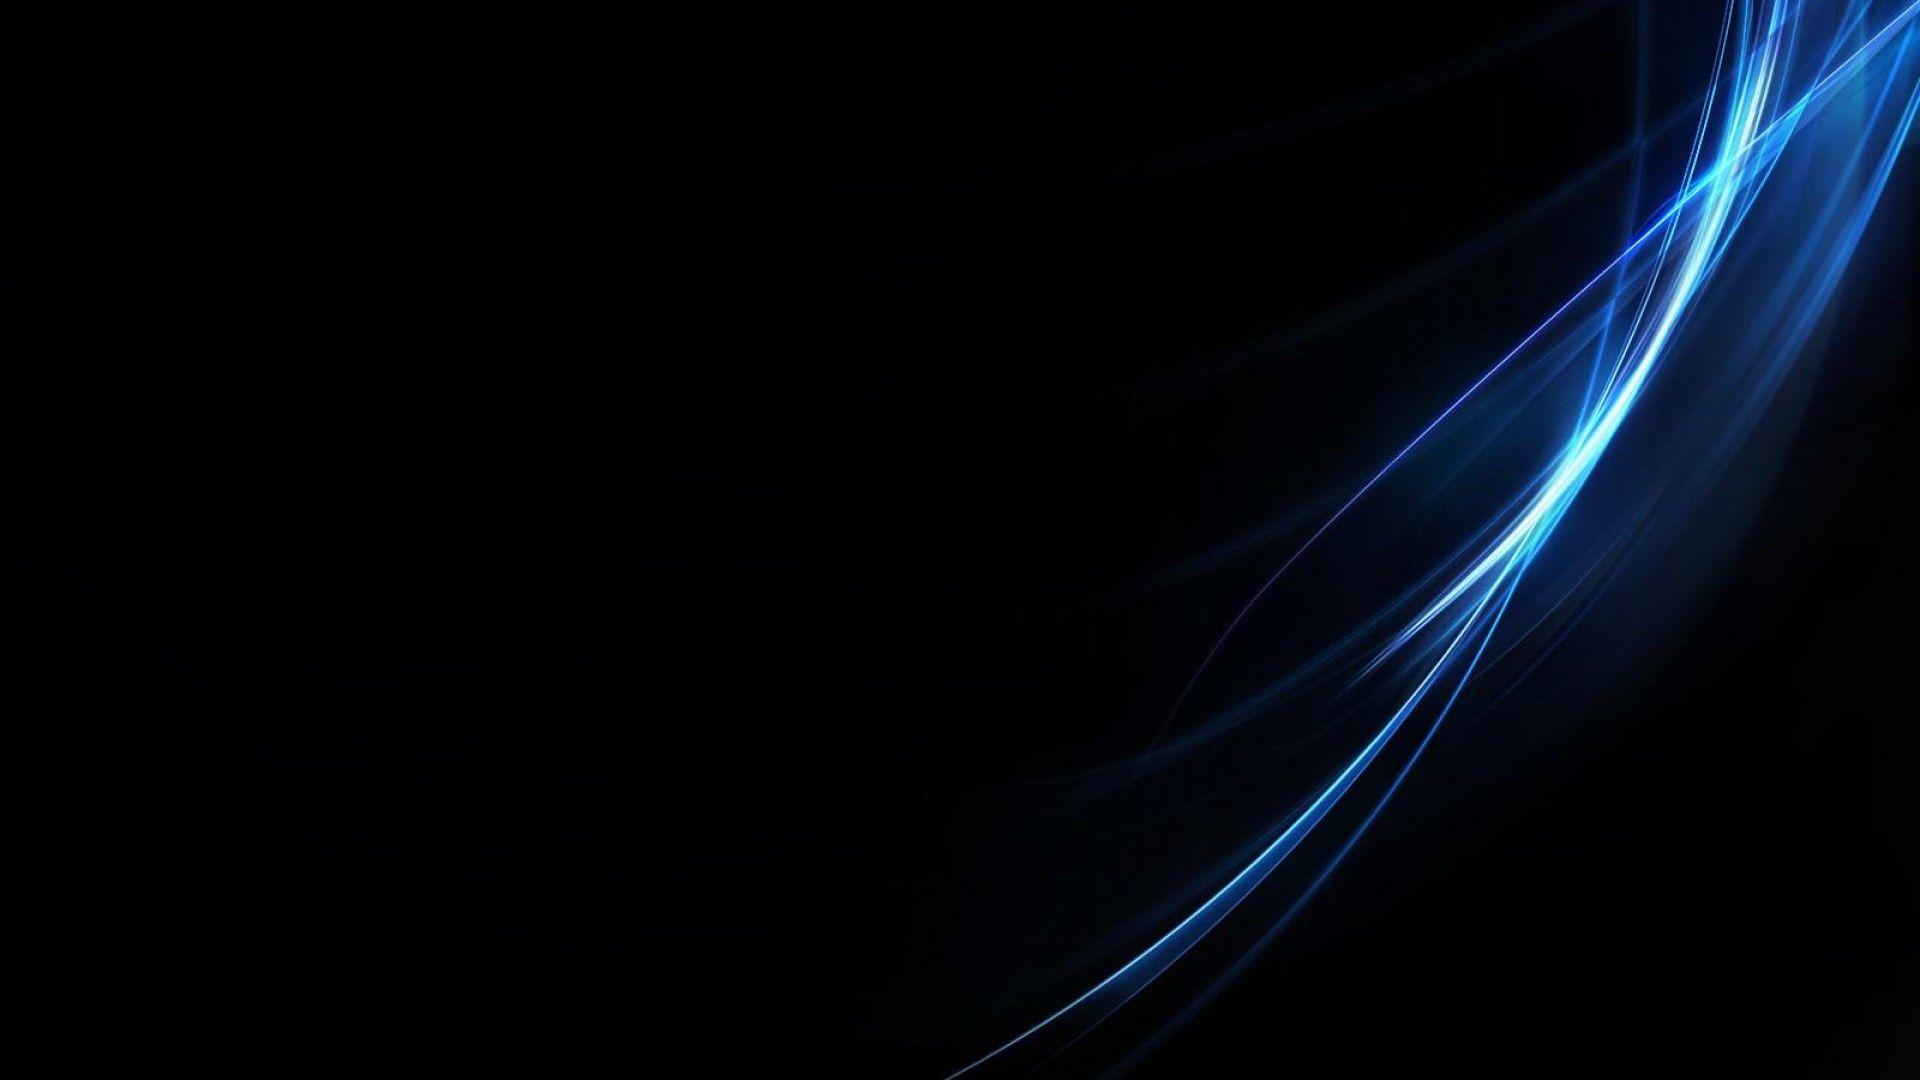 Black And Blue Desktop Wallpaper Dark Wallpaper Black And Blue Wallpaper Black Background Wallpaper